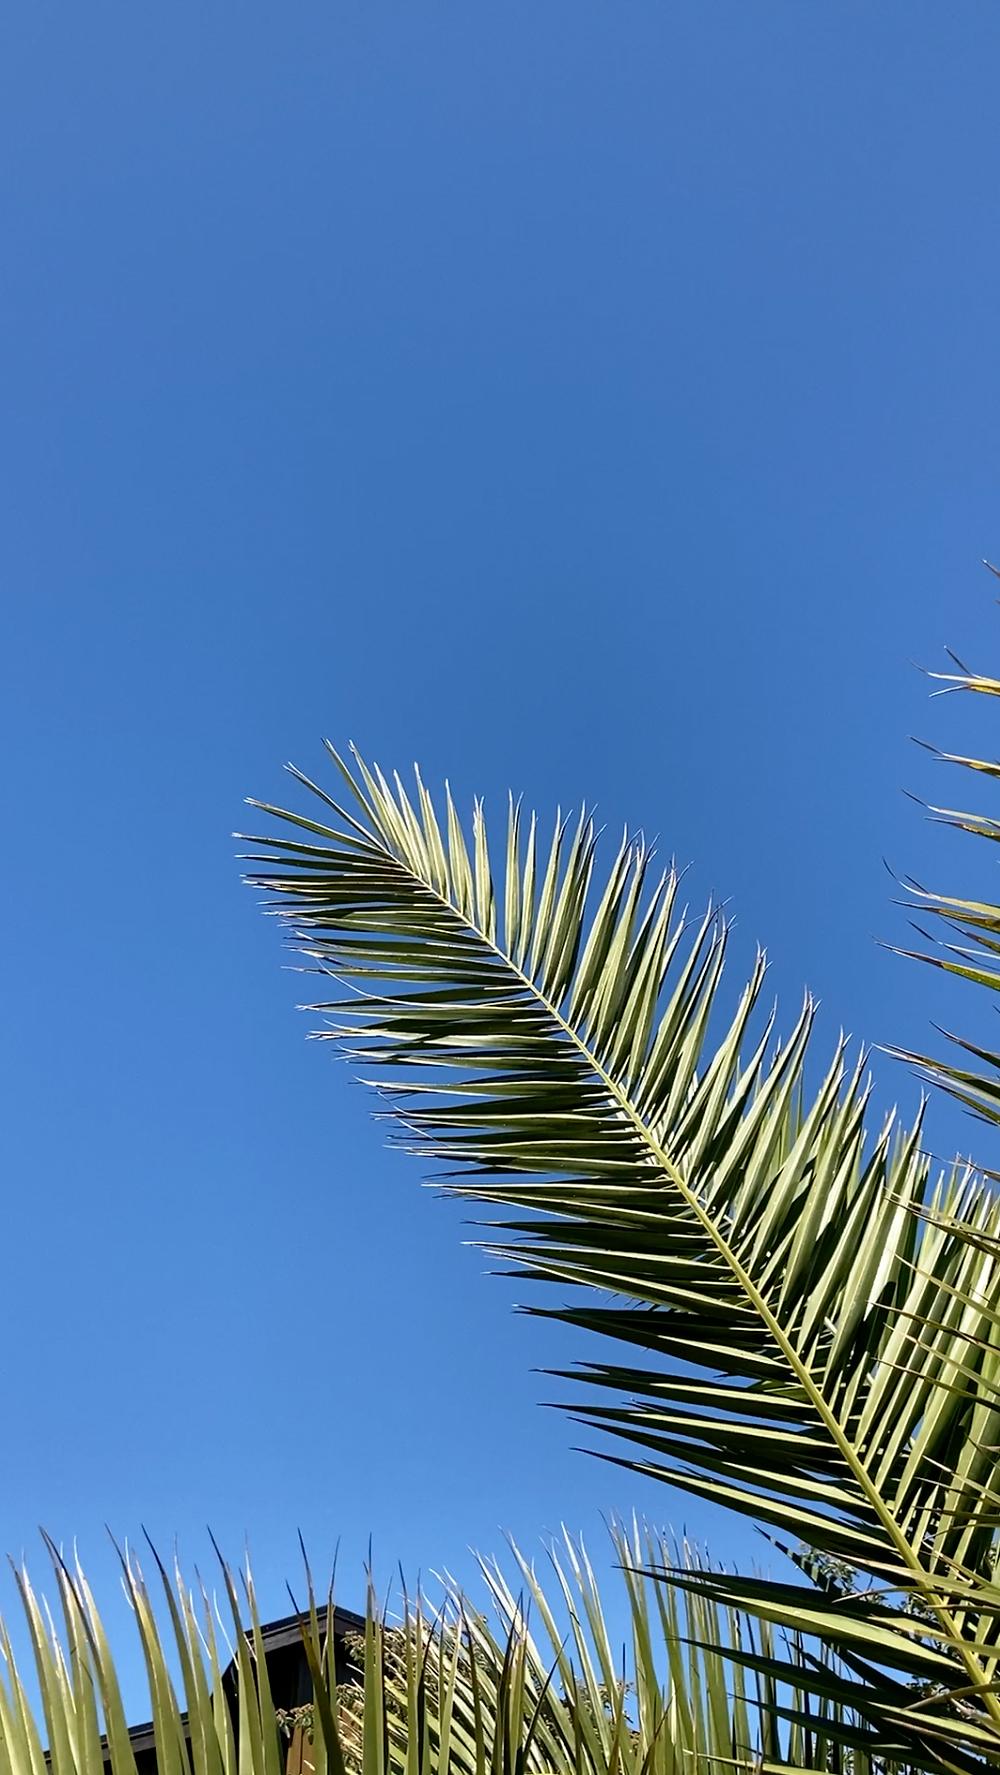 Palmblad mot en blå himmel